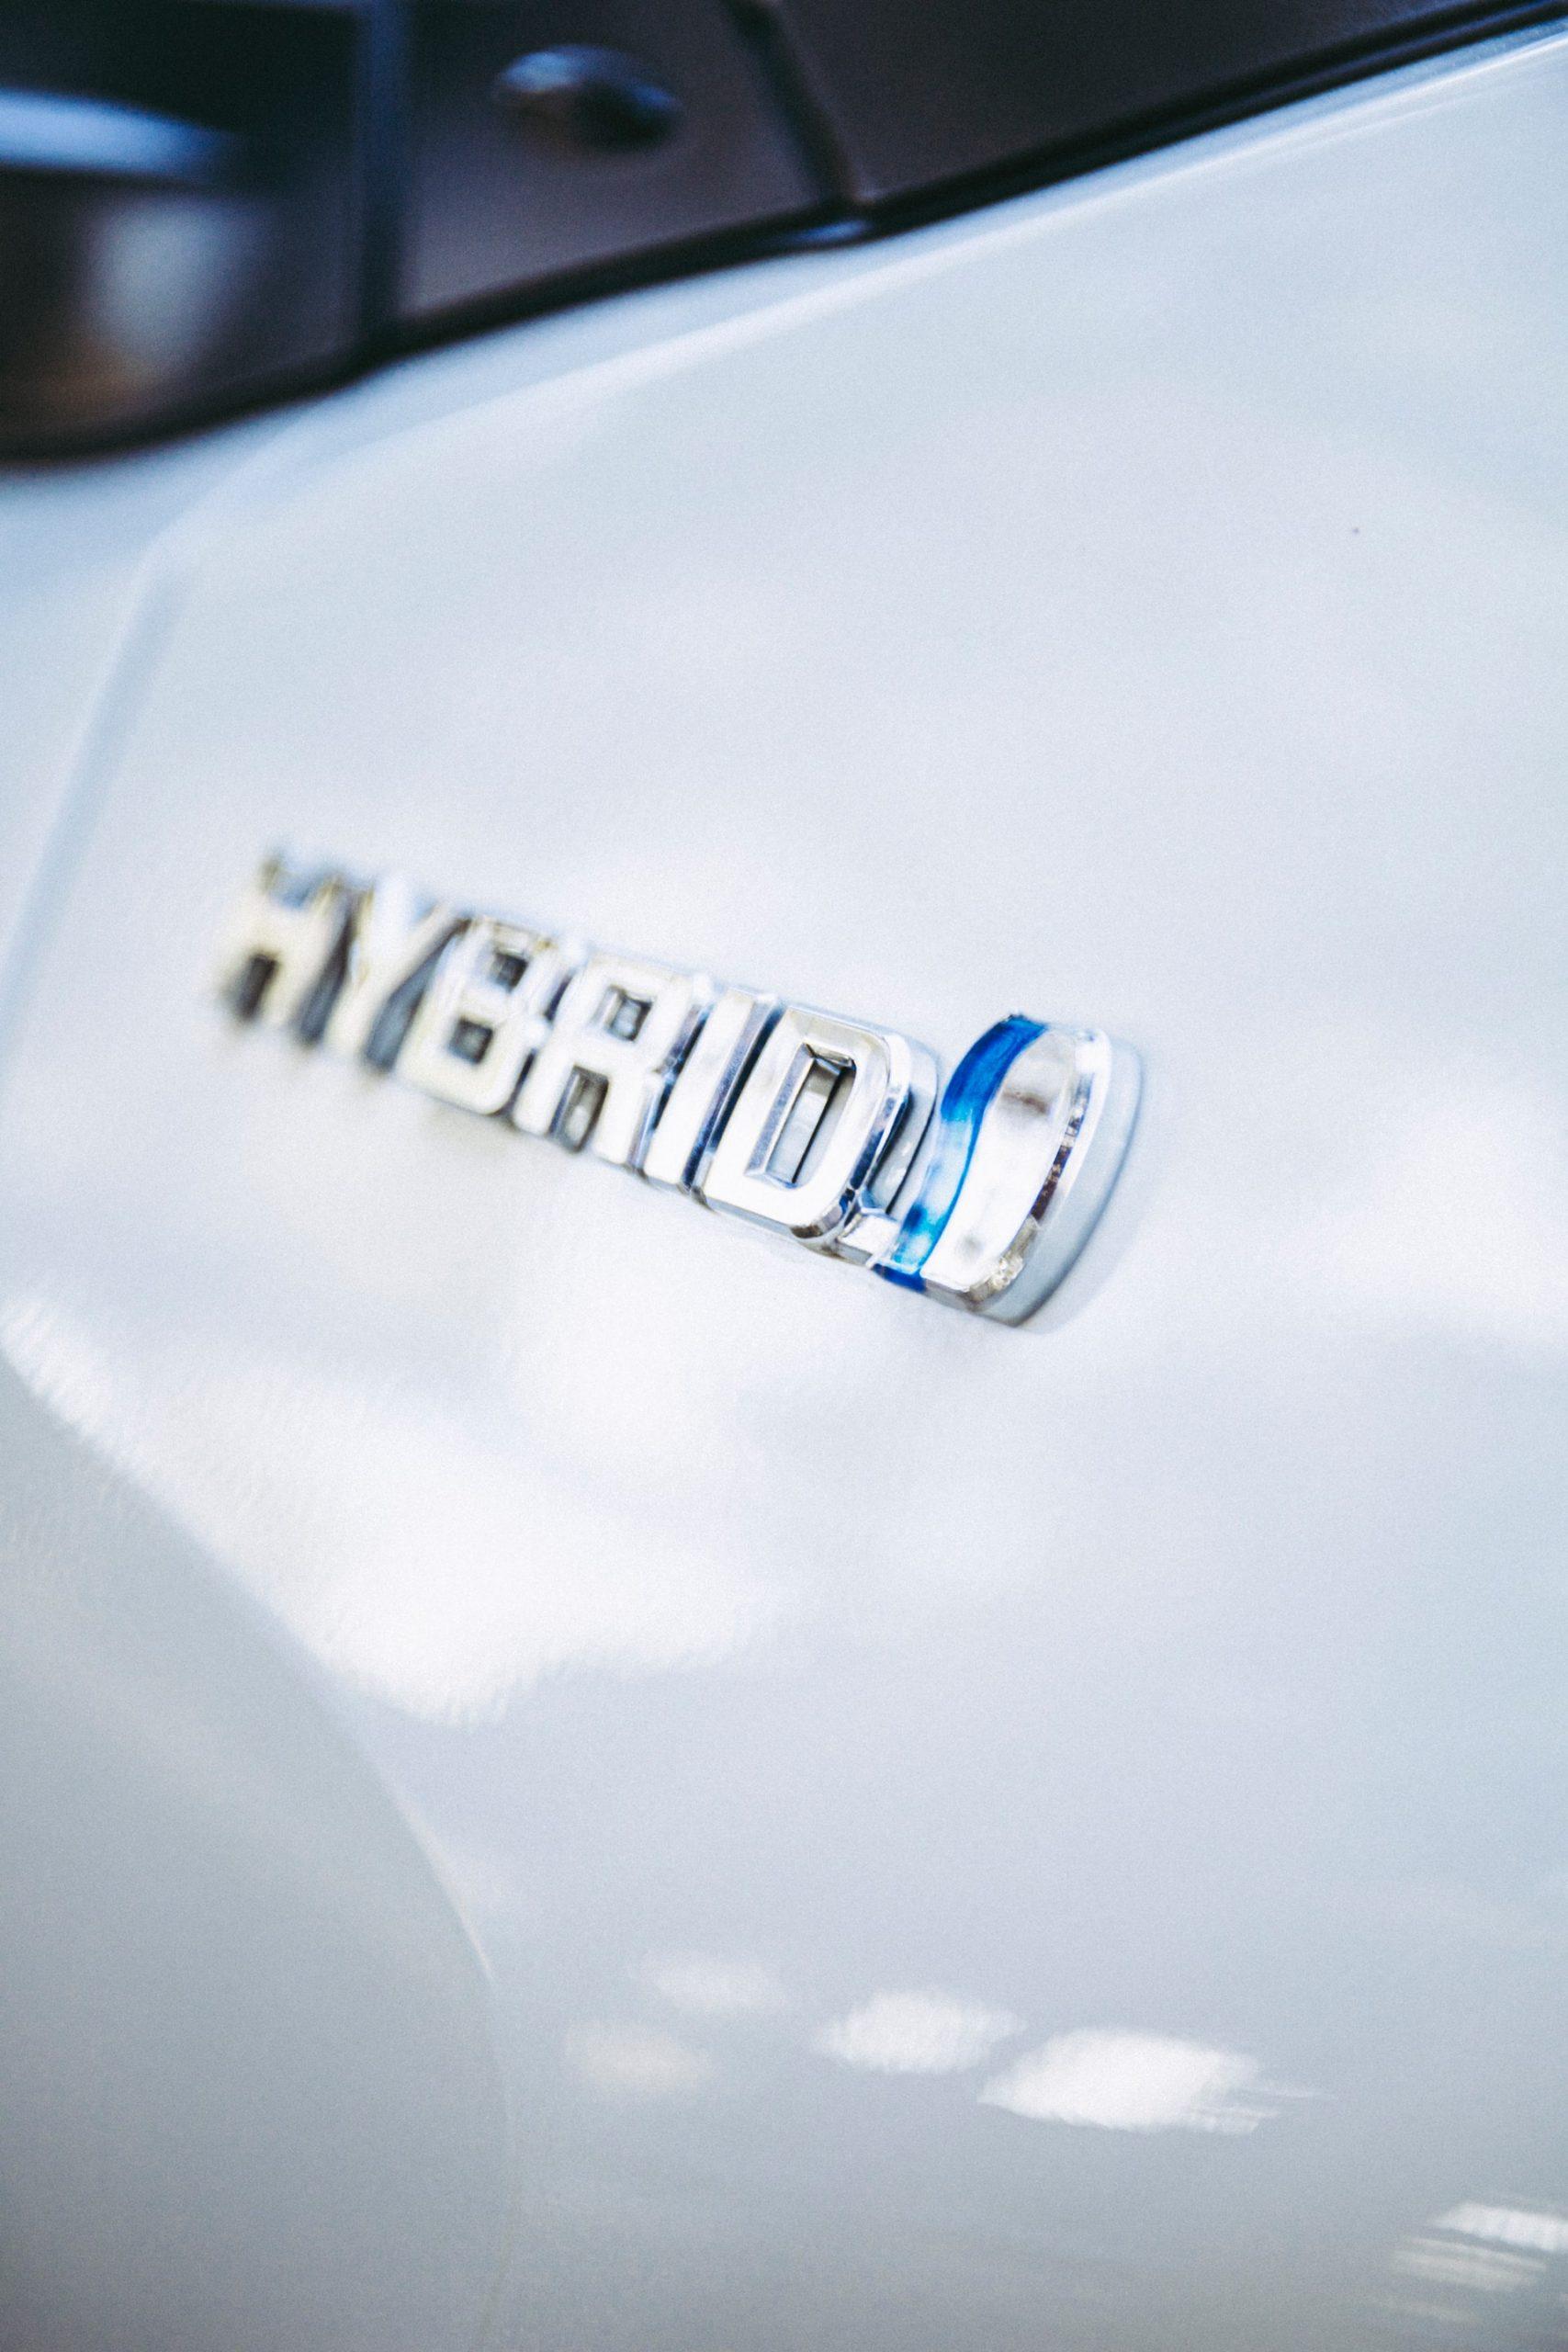 Benefits Hybrid Cars Article Image